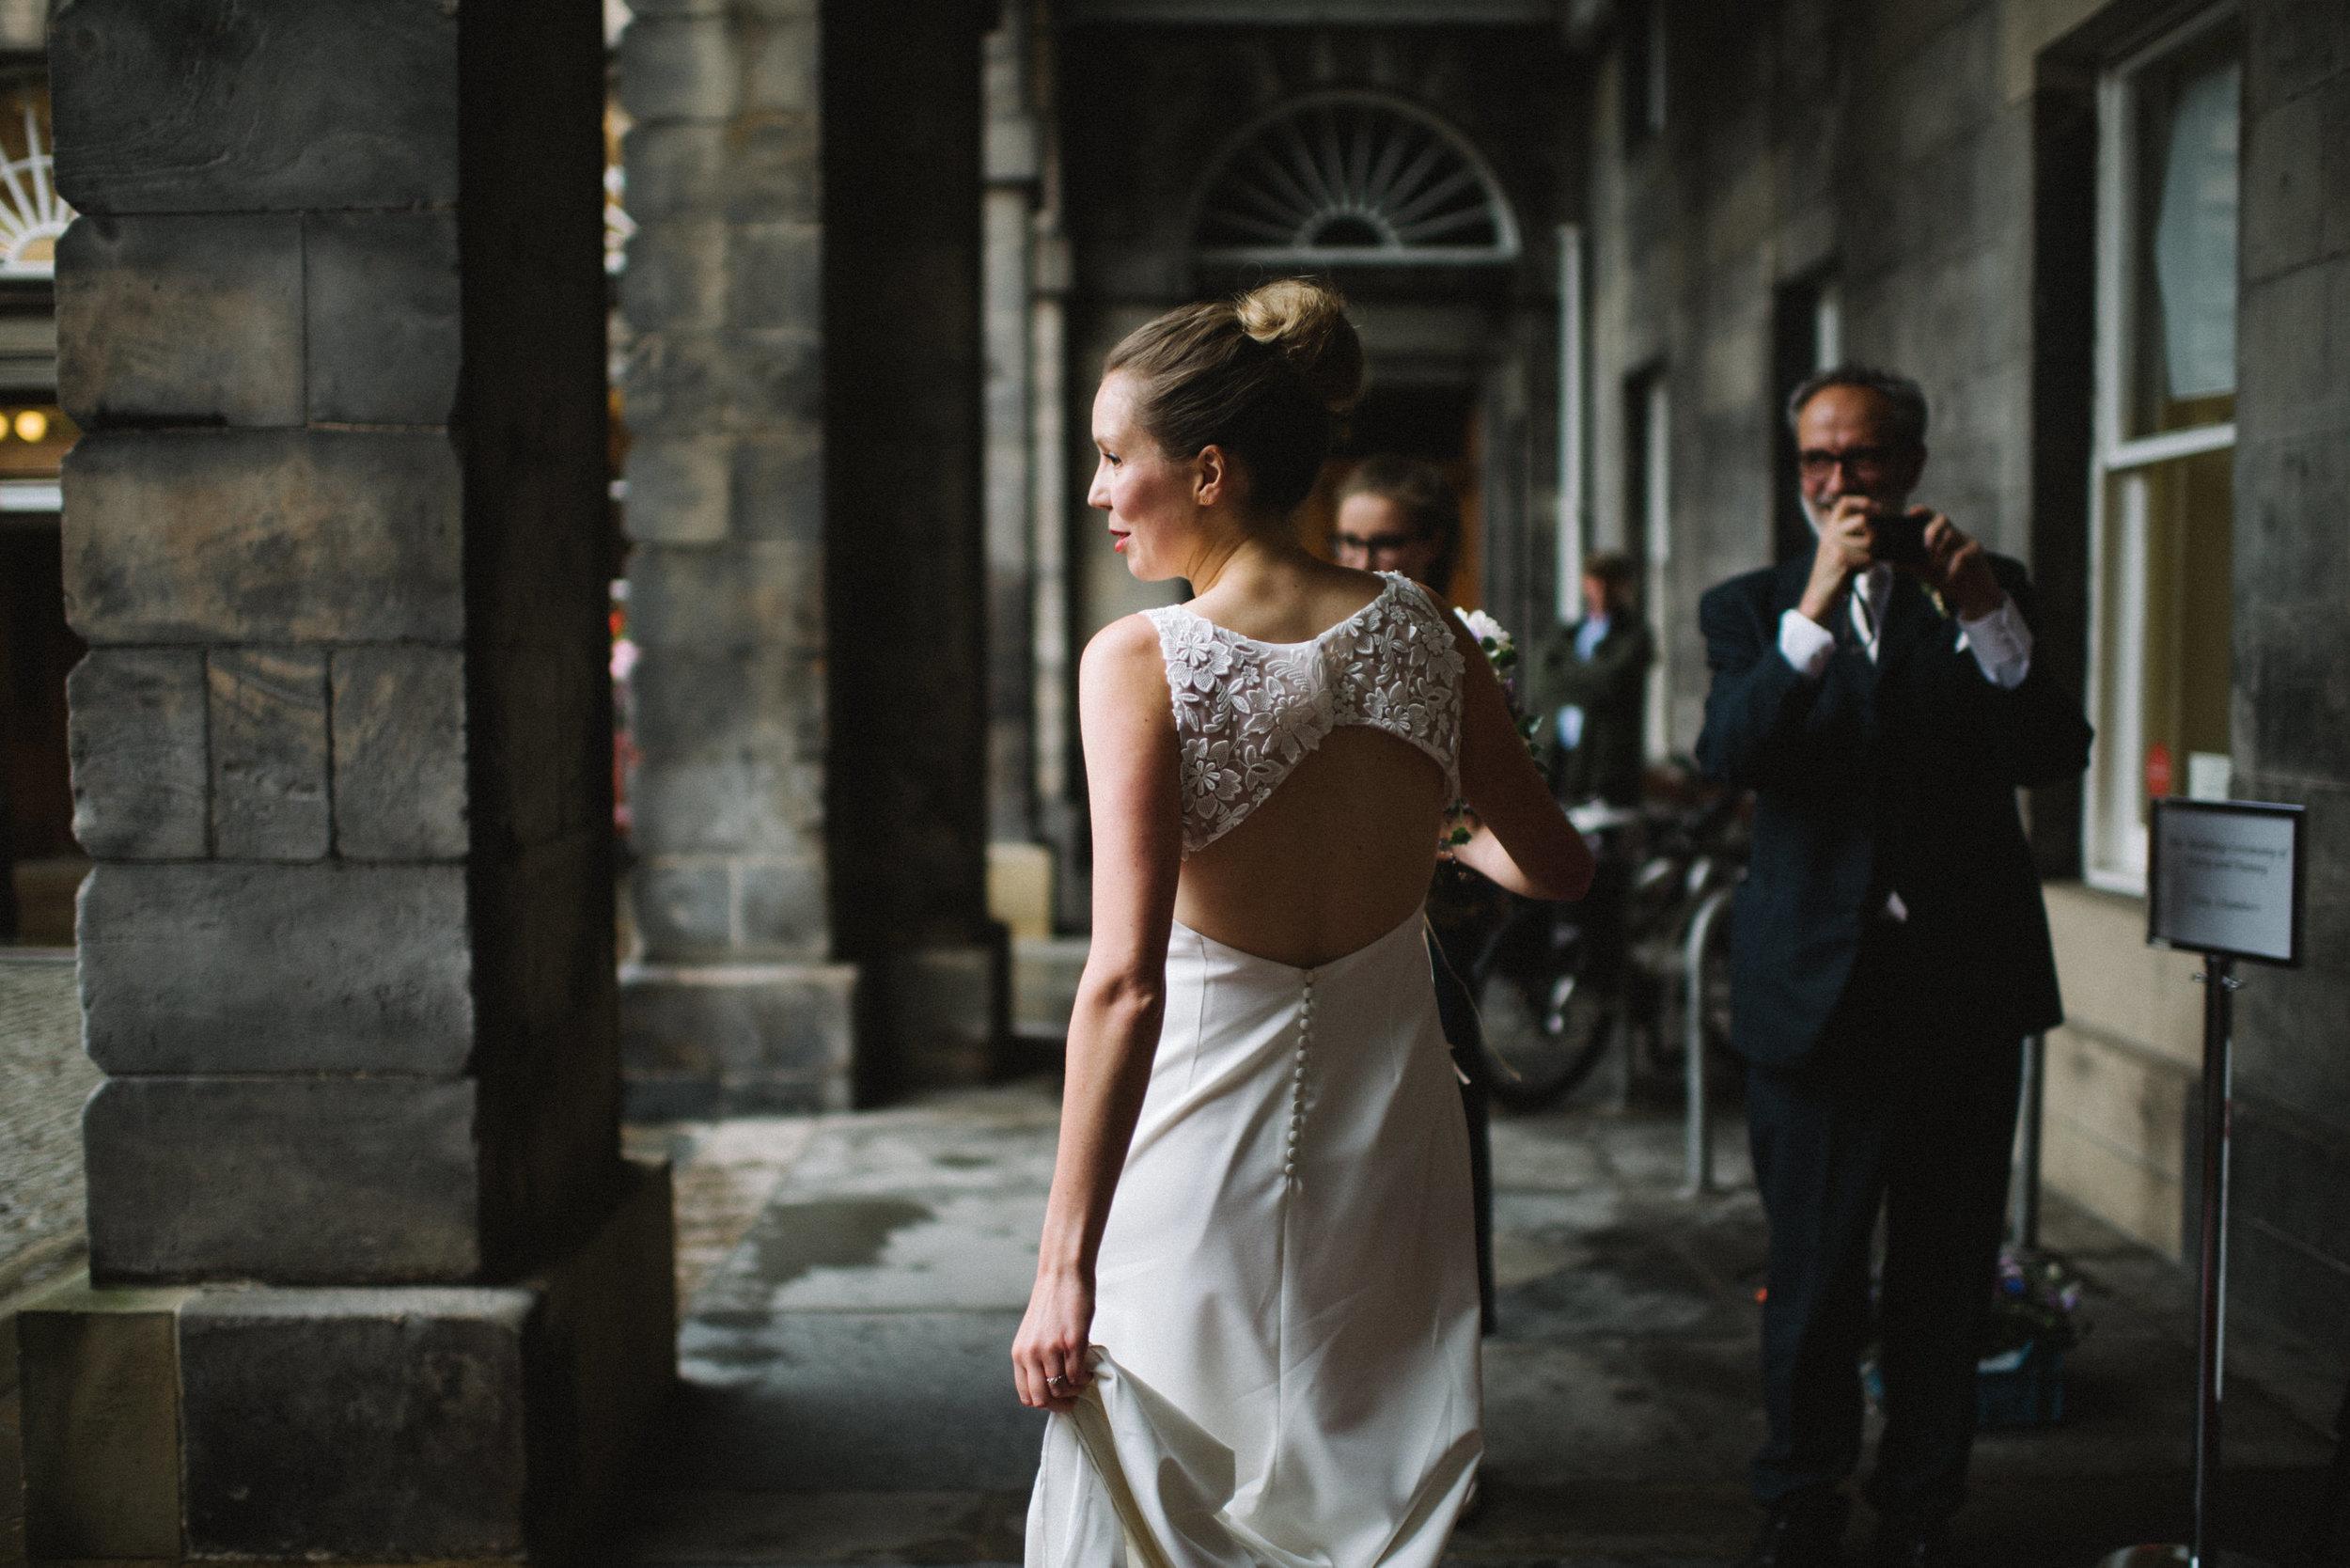 0047-LISA-DEVINE-PHOTOGRAPHY-ALTERNATIVE-WEDDING-PHOTOGRAPHY-SCOTLAND-DESTINATION-WEDDINGS-GLASGOW-WEDDINGS-COOL-WEDDINGS-STYLISH-WEDDINGS.JPG